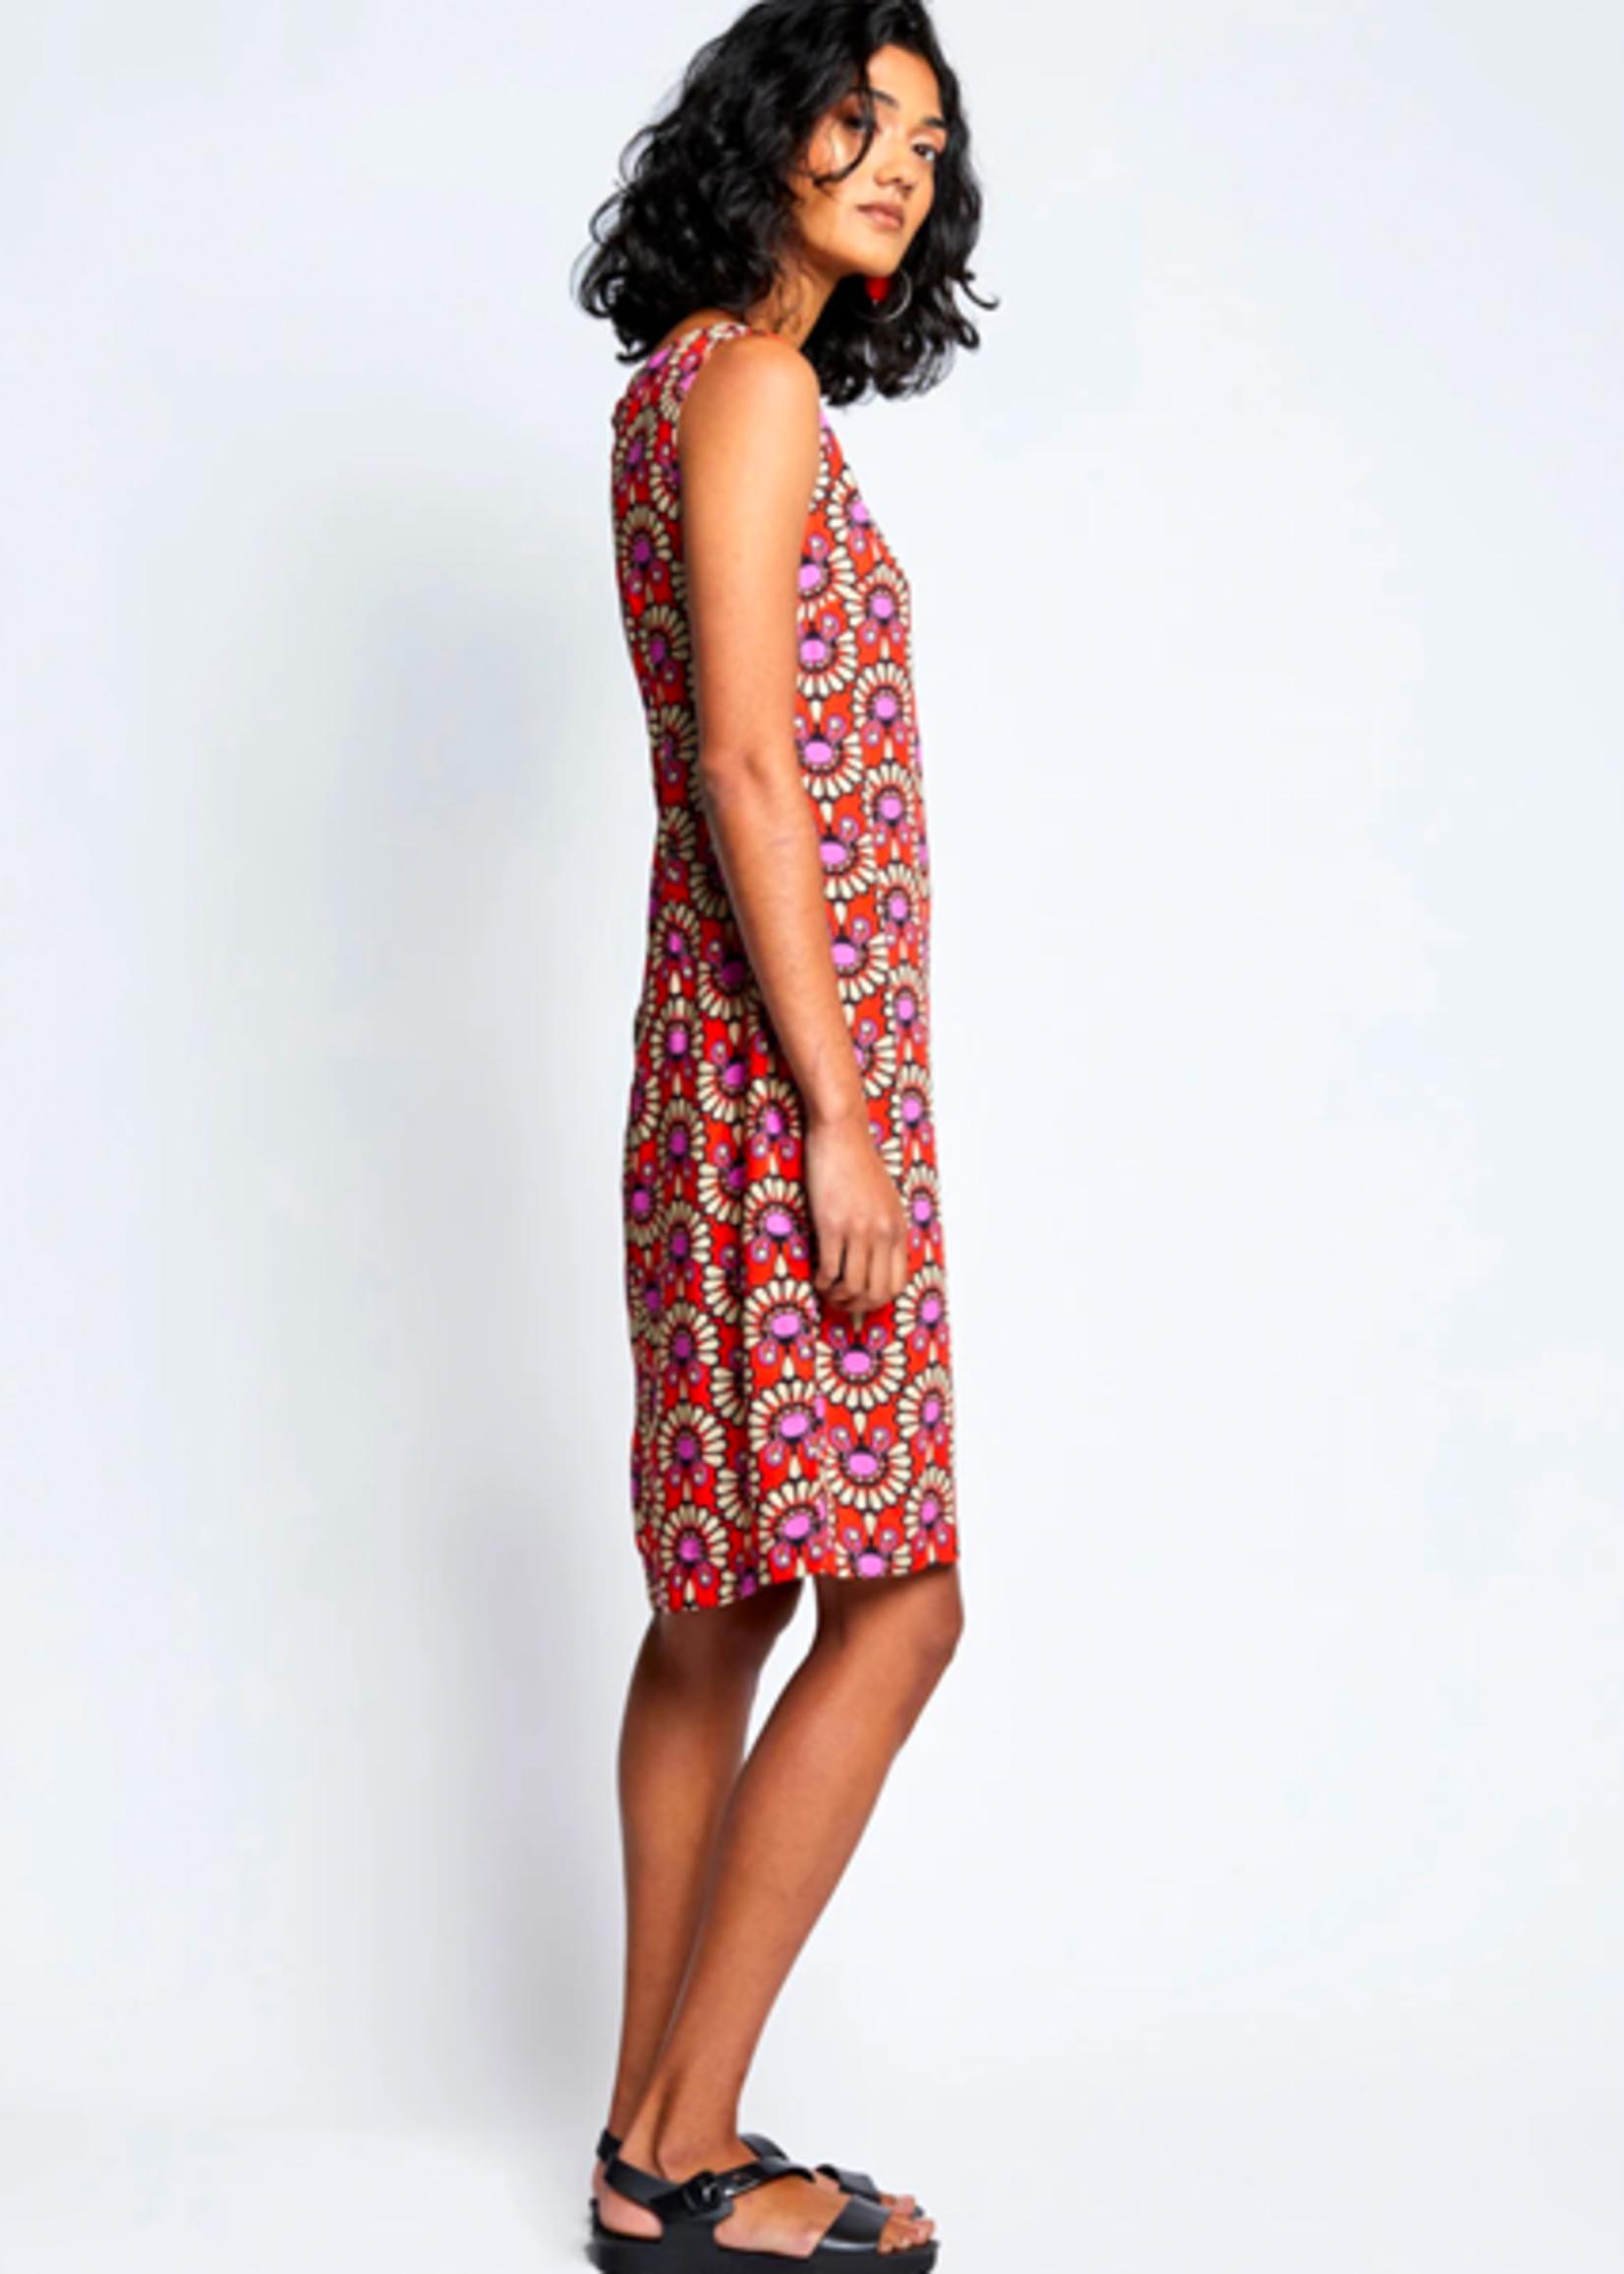 Totem Sare Dress in Cocar Paprika